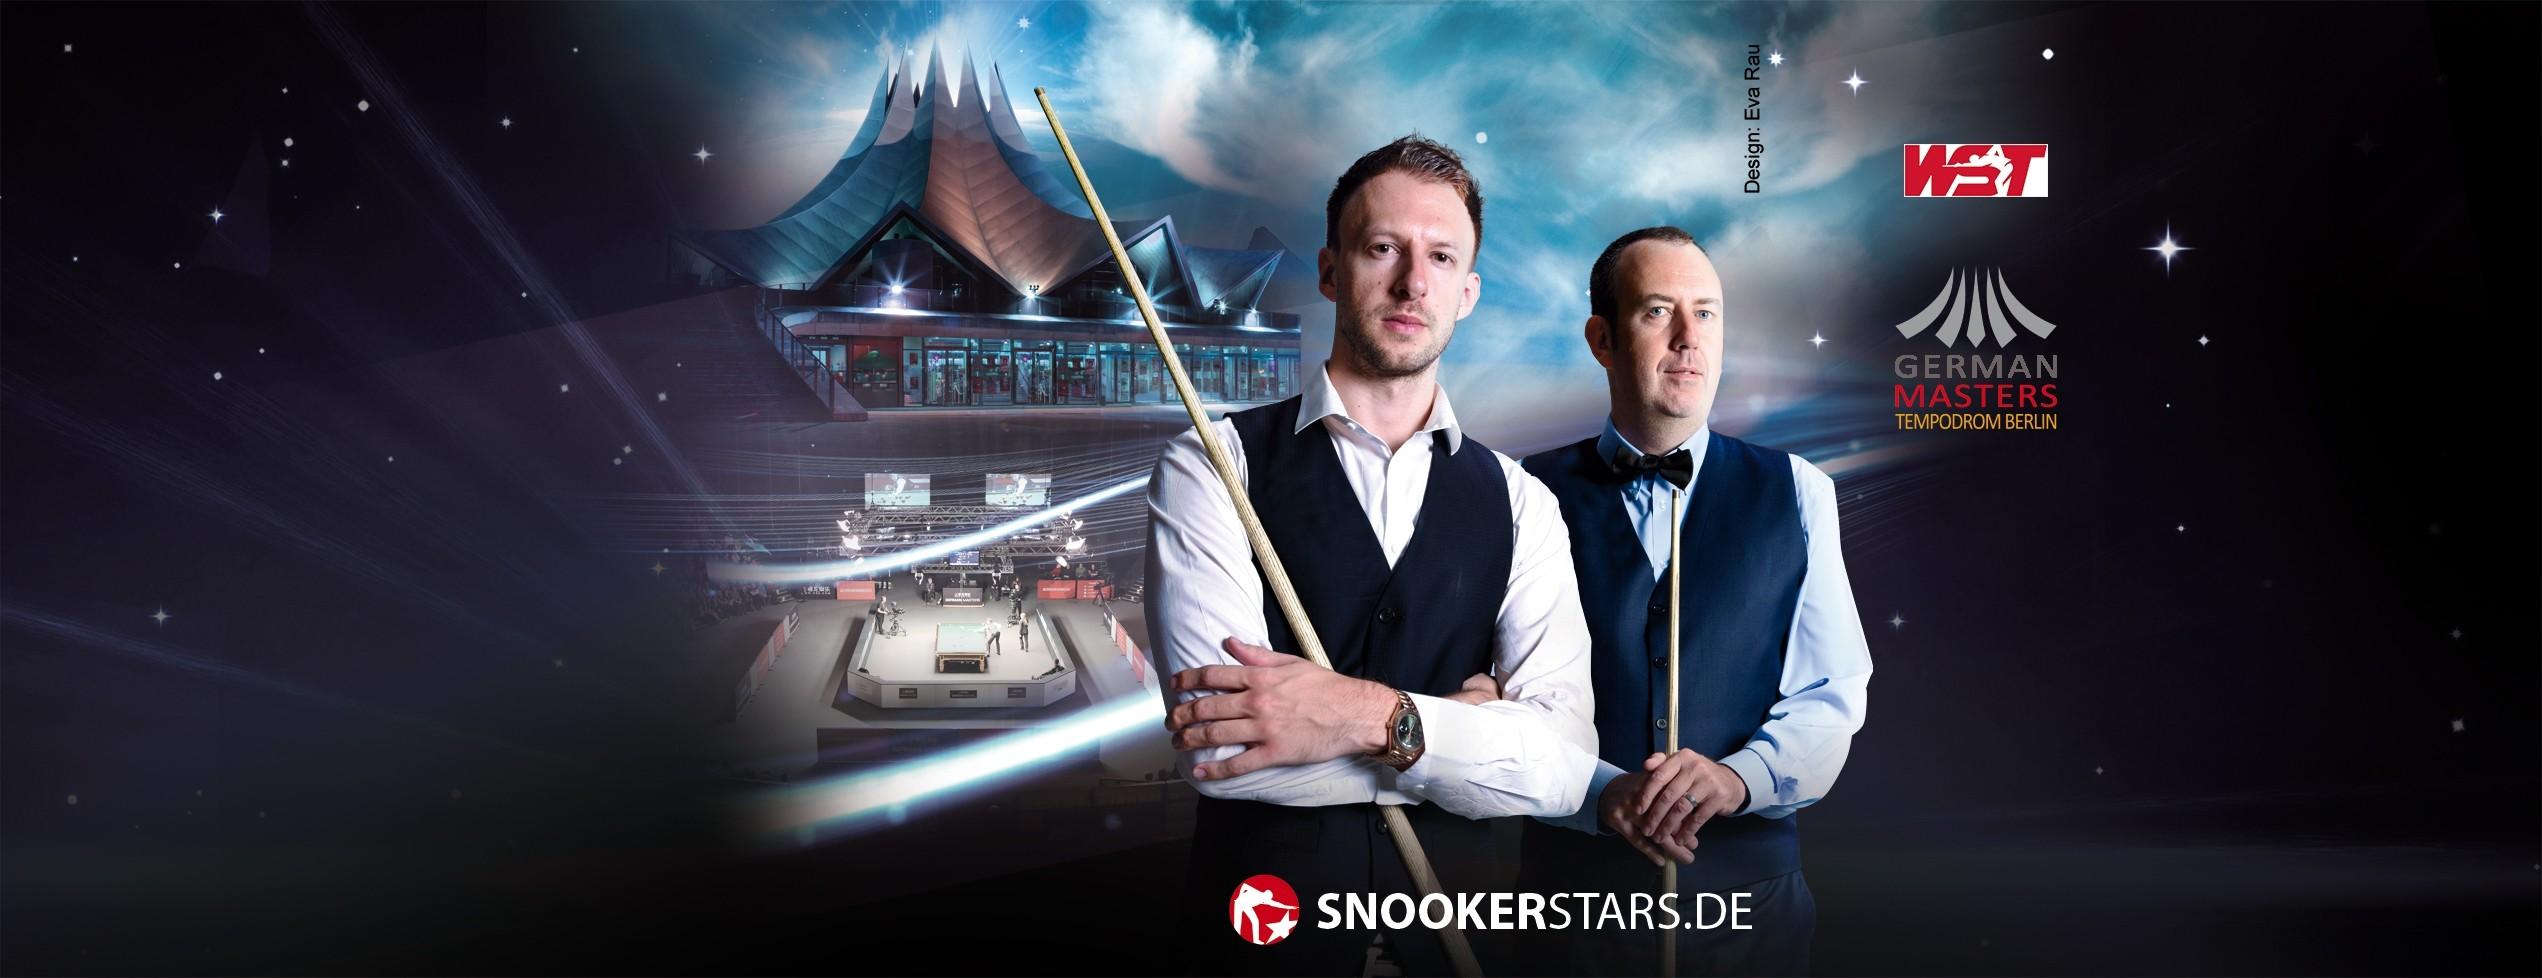 German Masters 30.01.2022 KAT 2 Abend-Session